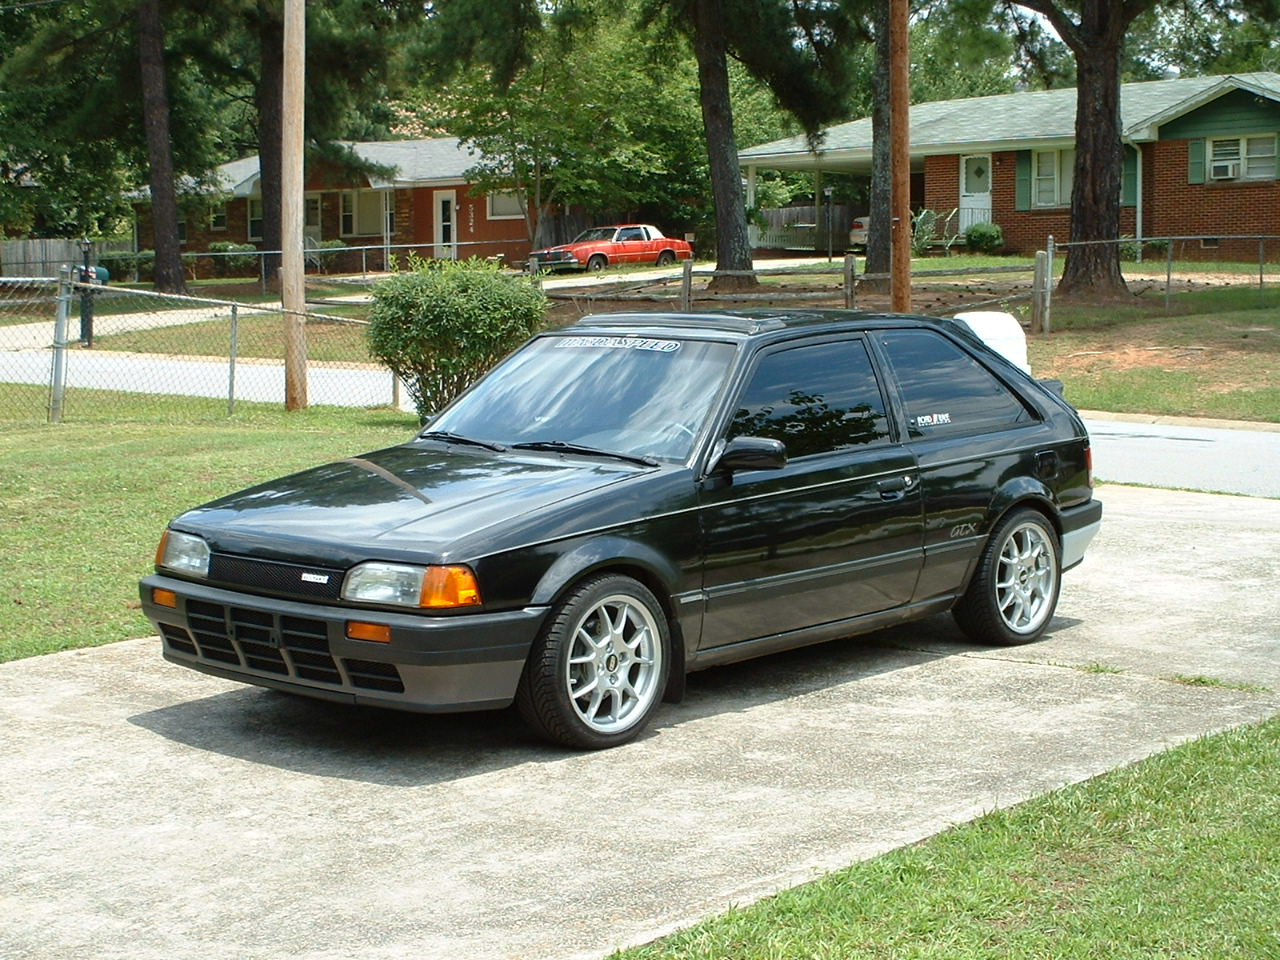 mazda 323 gtx for sale craigslist | autoblog